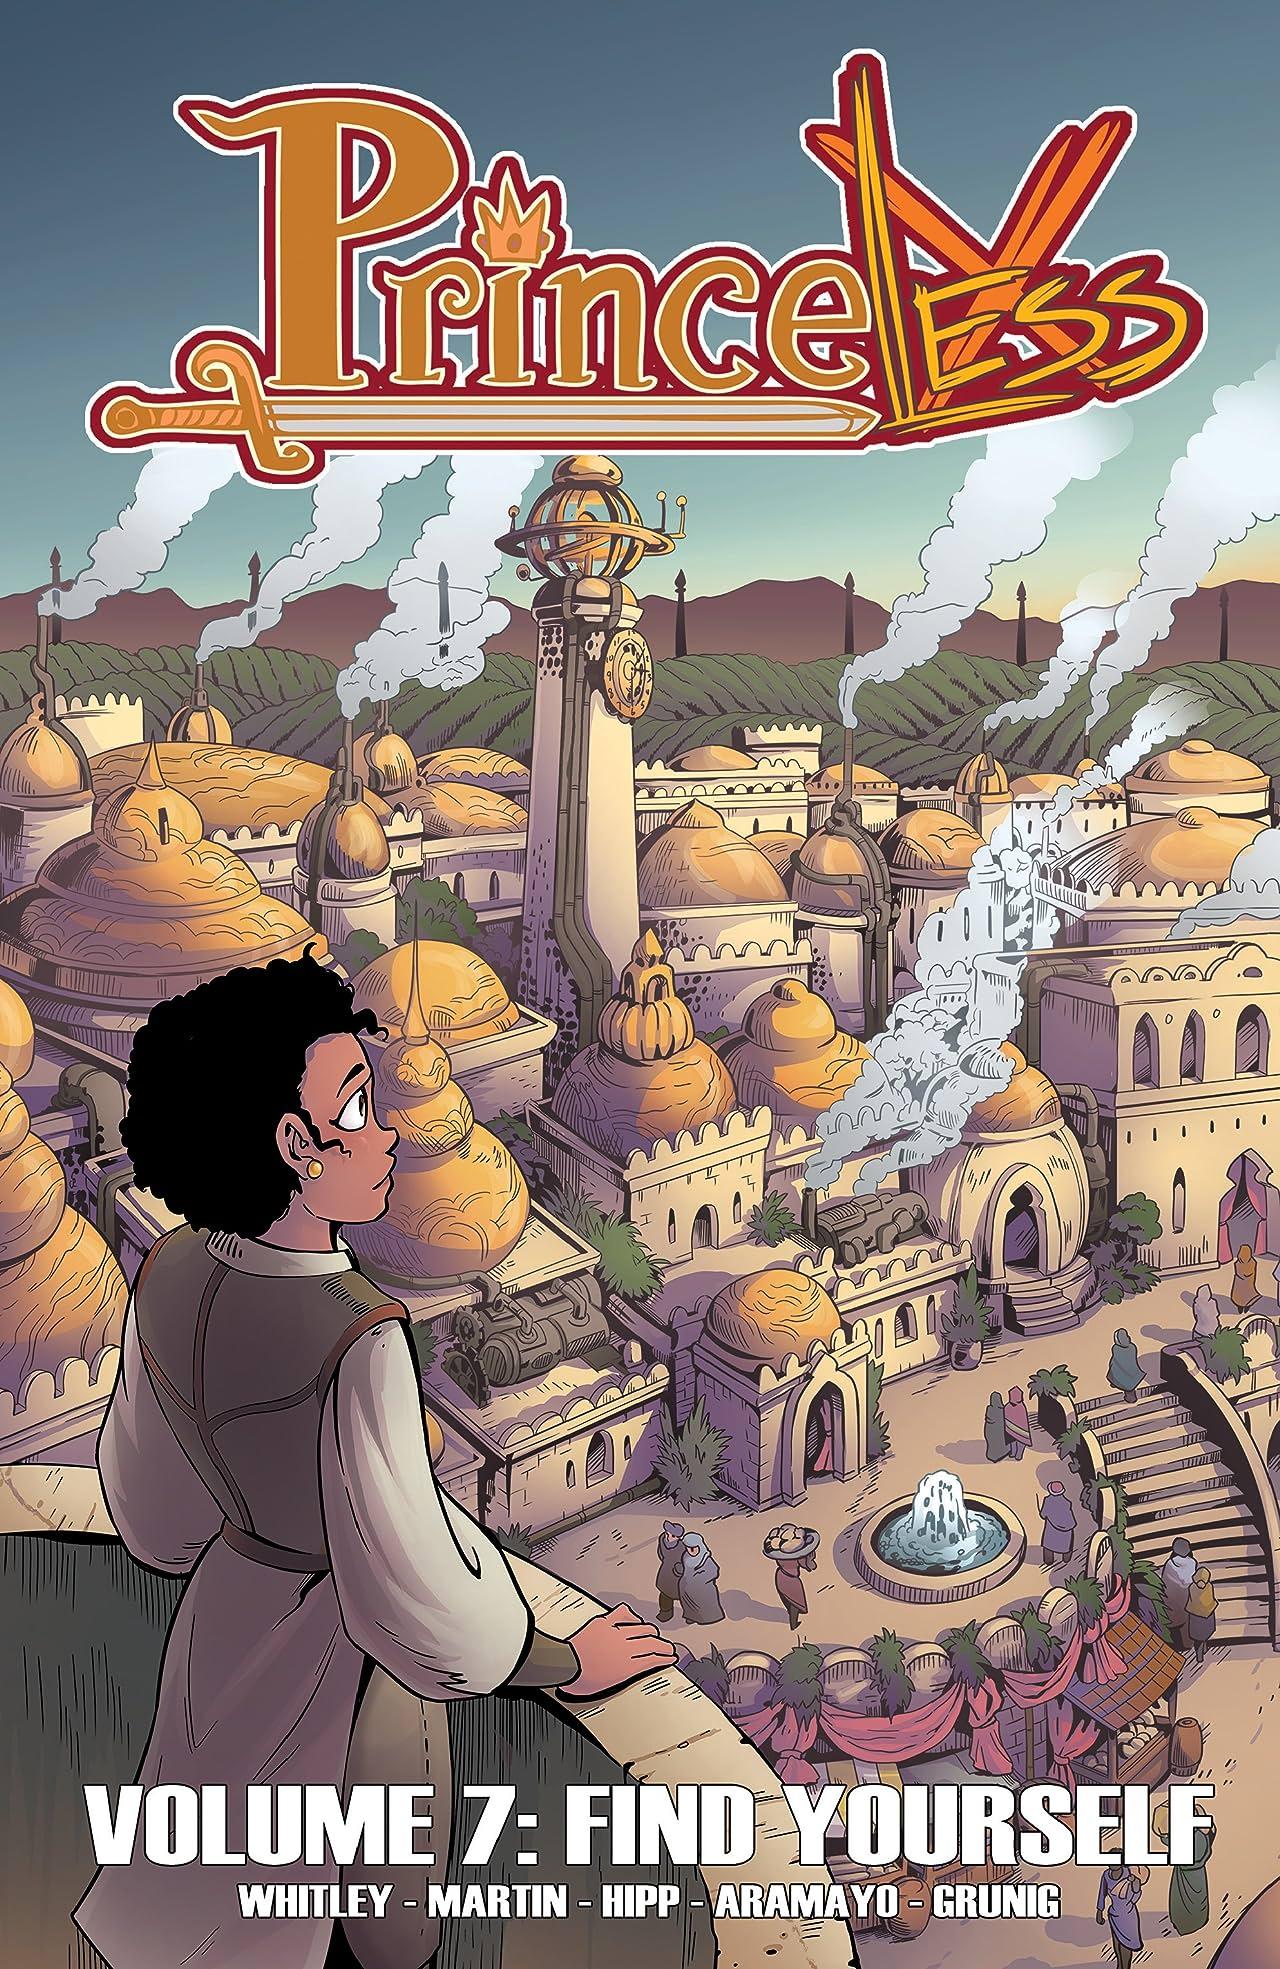 Princeless: Book 7 - Find Yourself